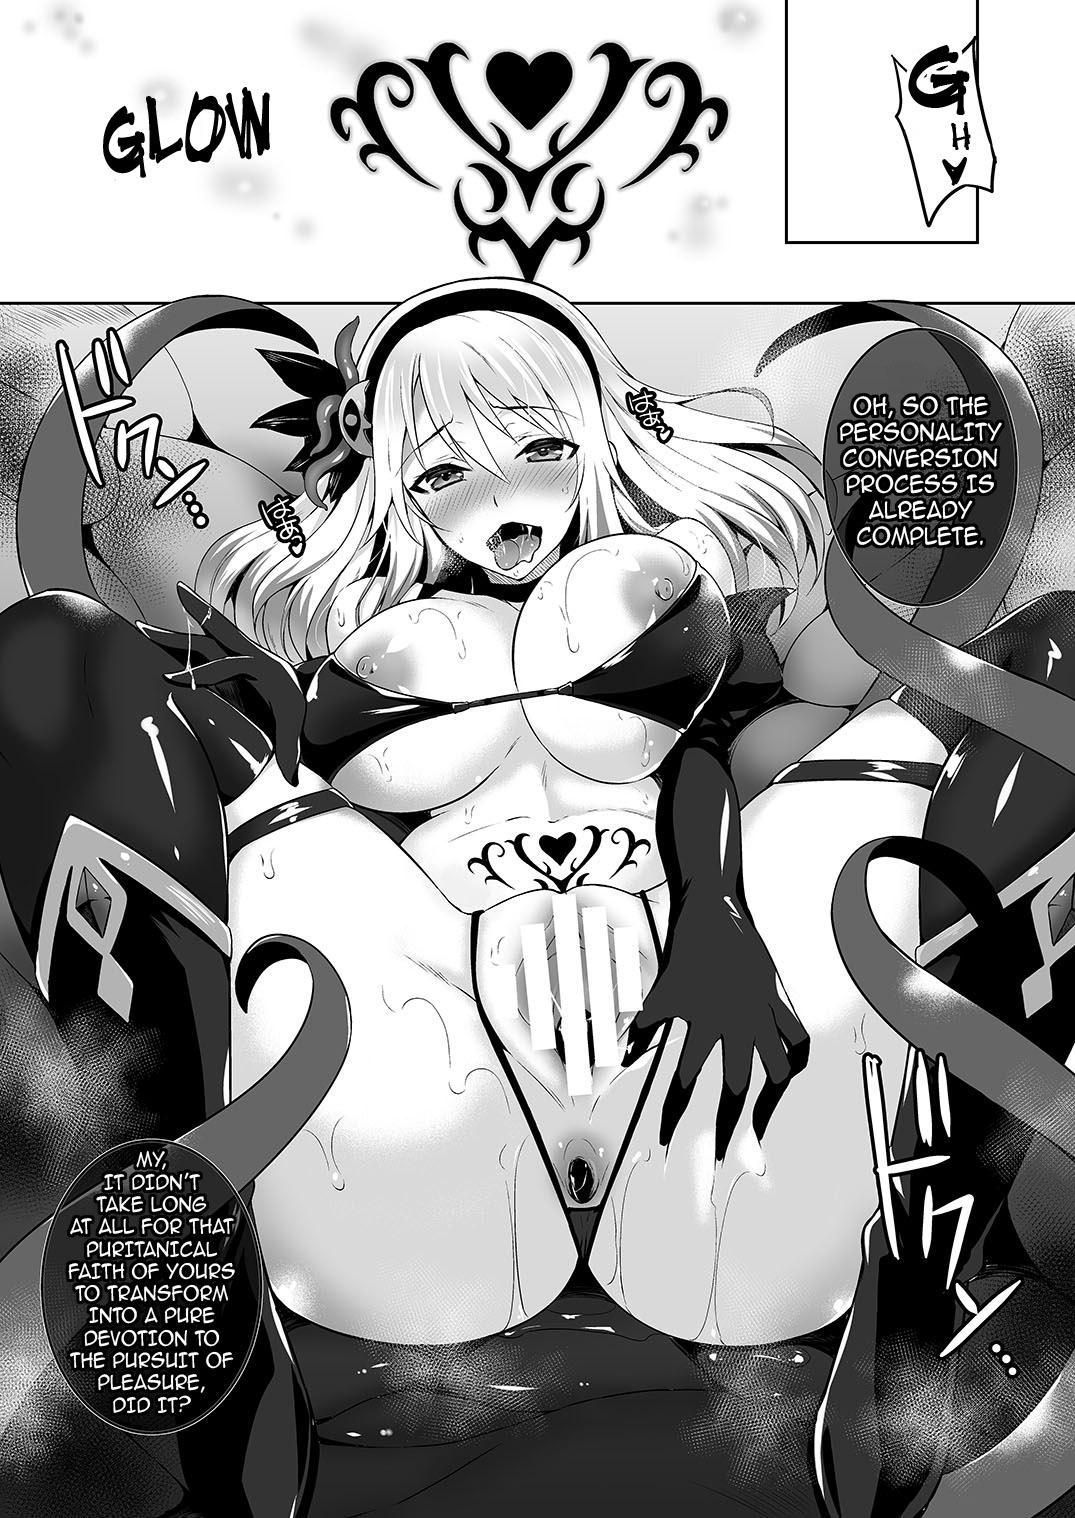 [Chococornet (Tenro Aya)] Falling - Mashoku no Sennou Dorei   Falling - Brainwashed Slave of the Great Wurm [English] {darknight} [Digital] 19